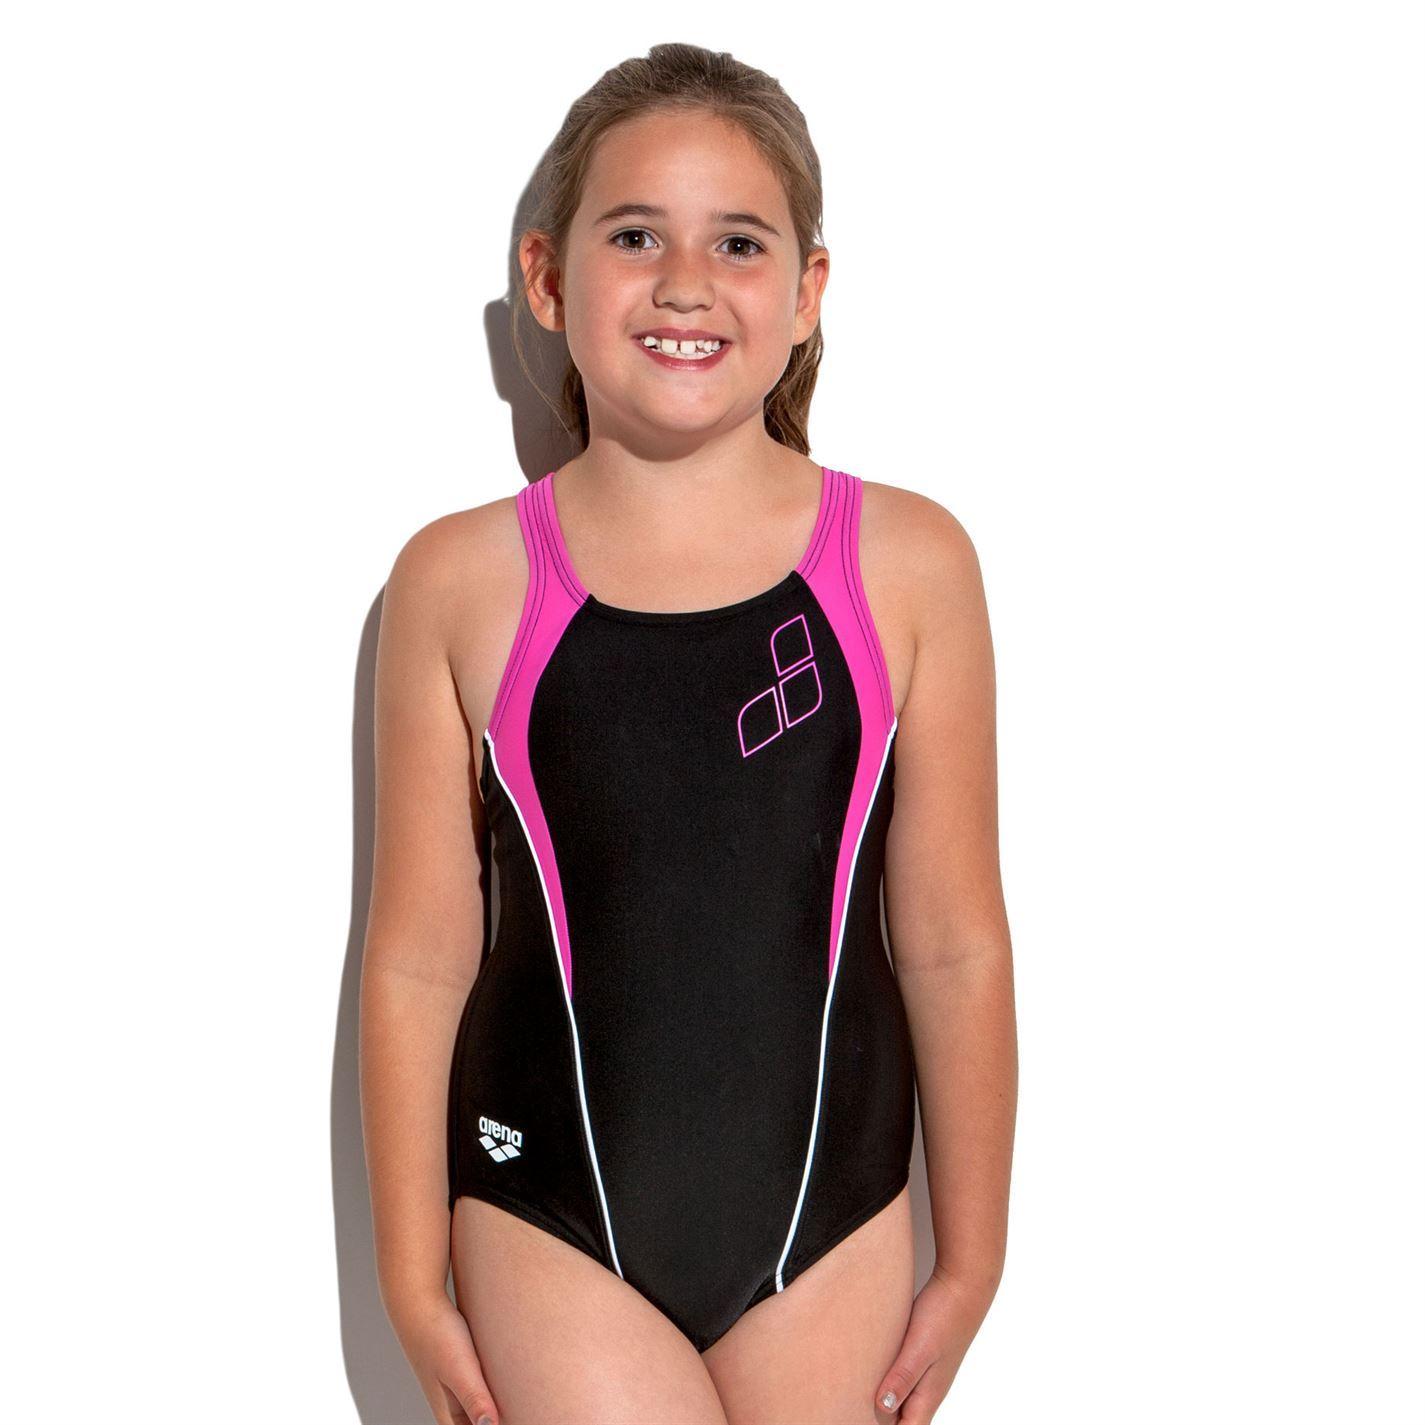 b79dd4cadef06 Arena Kids Girls Fre Ladies Swimsuit Bathing Suit Swimming Costume ...